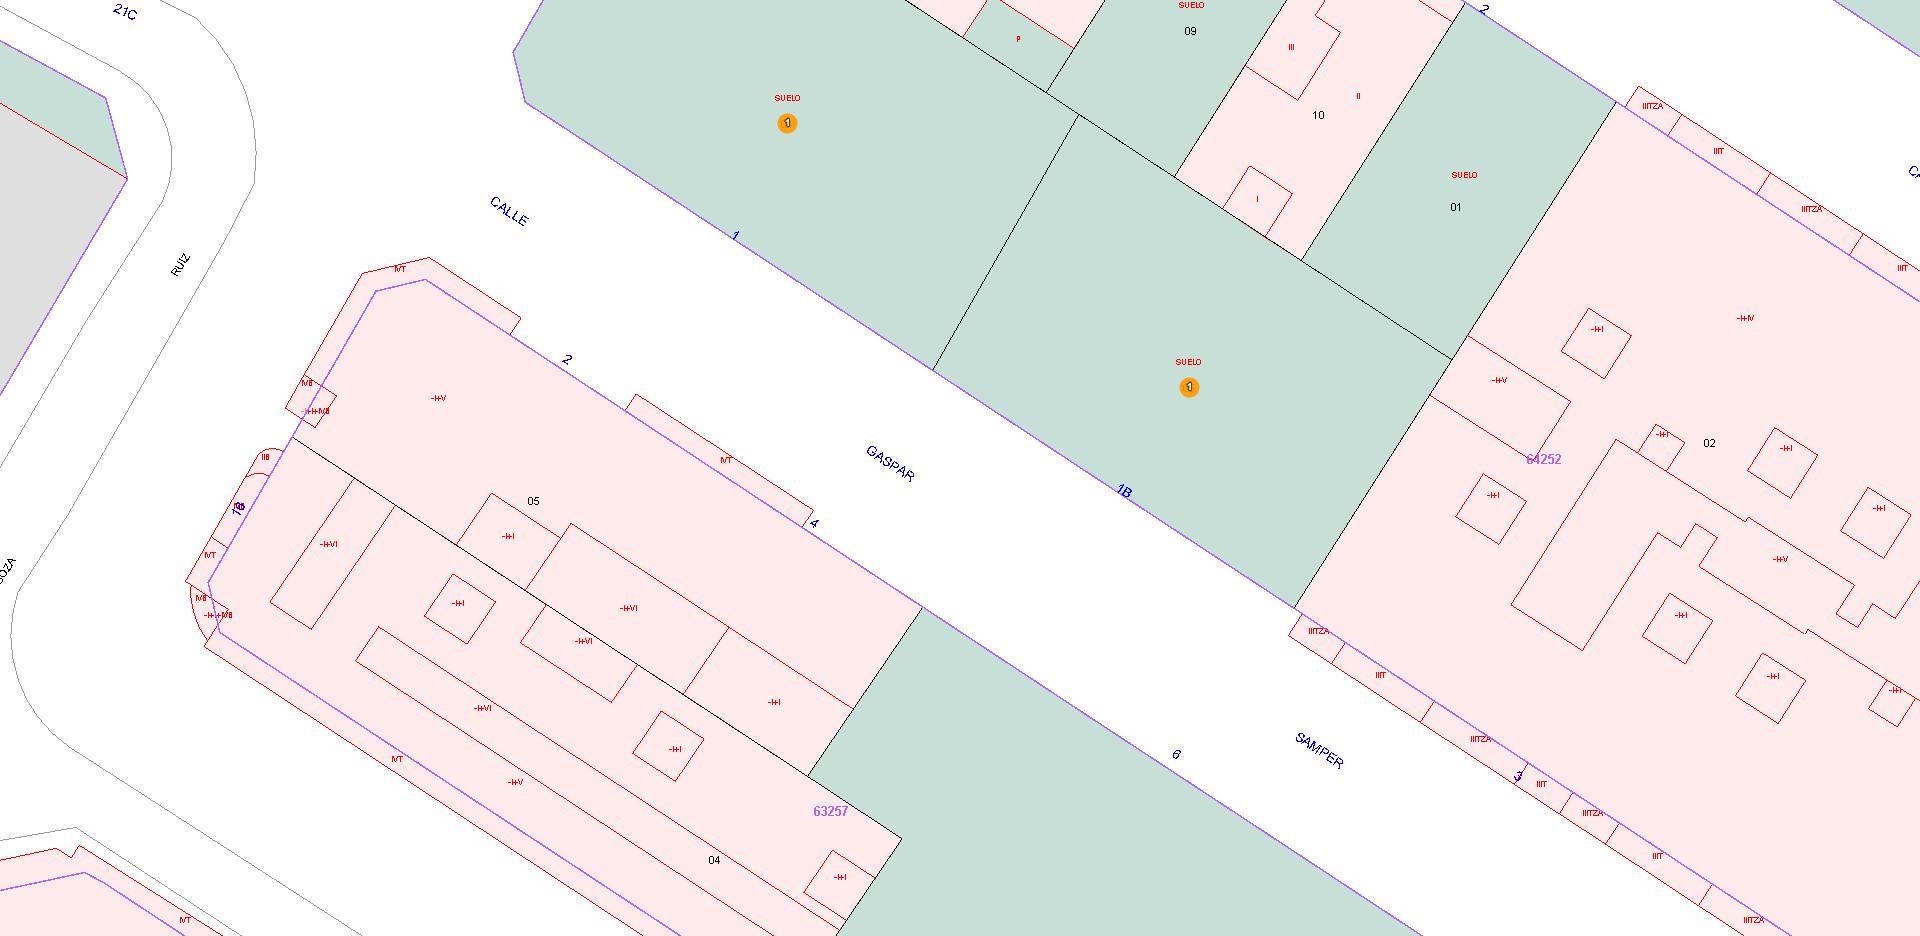 Solar de 446 m2 en el centro de Callosa del Segura